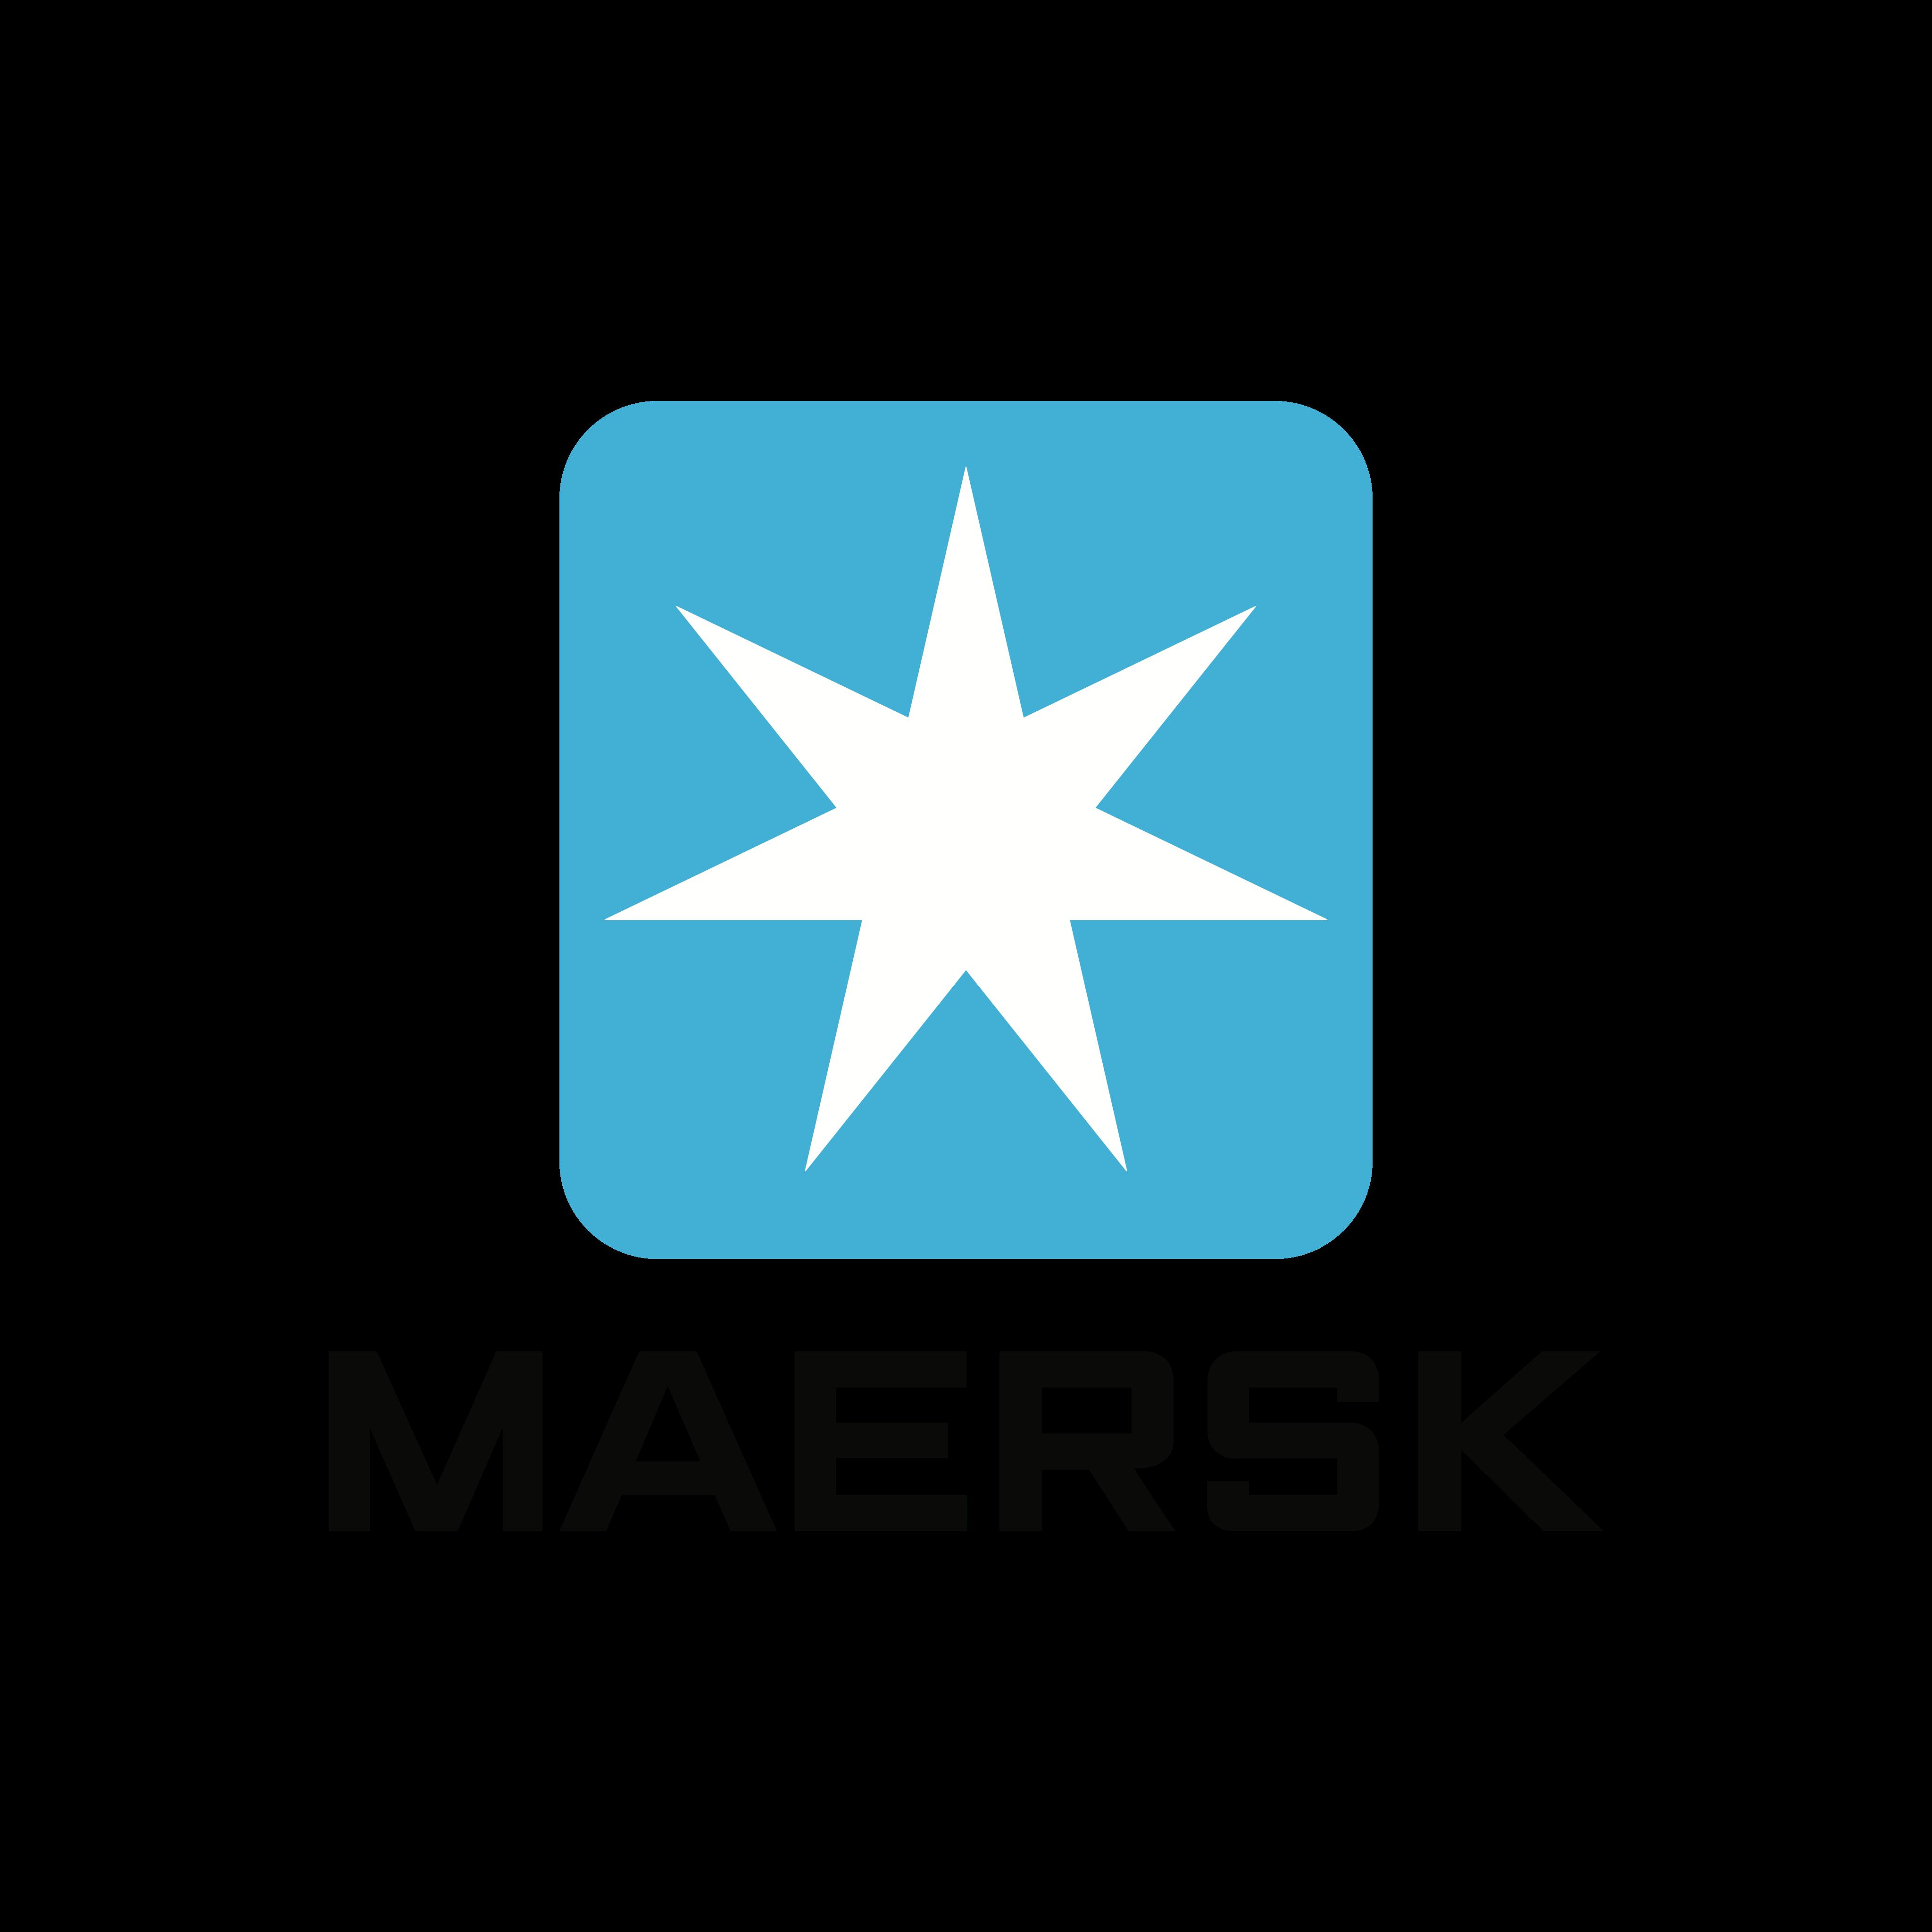 maersk logo 0 - Maersk Logo